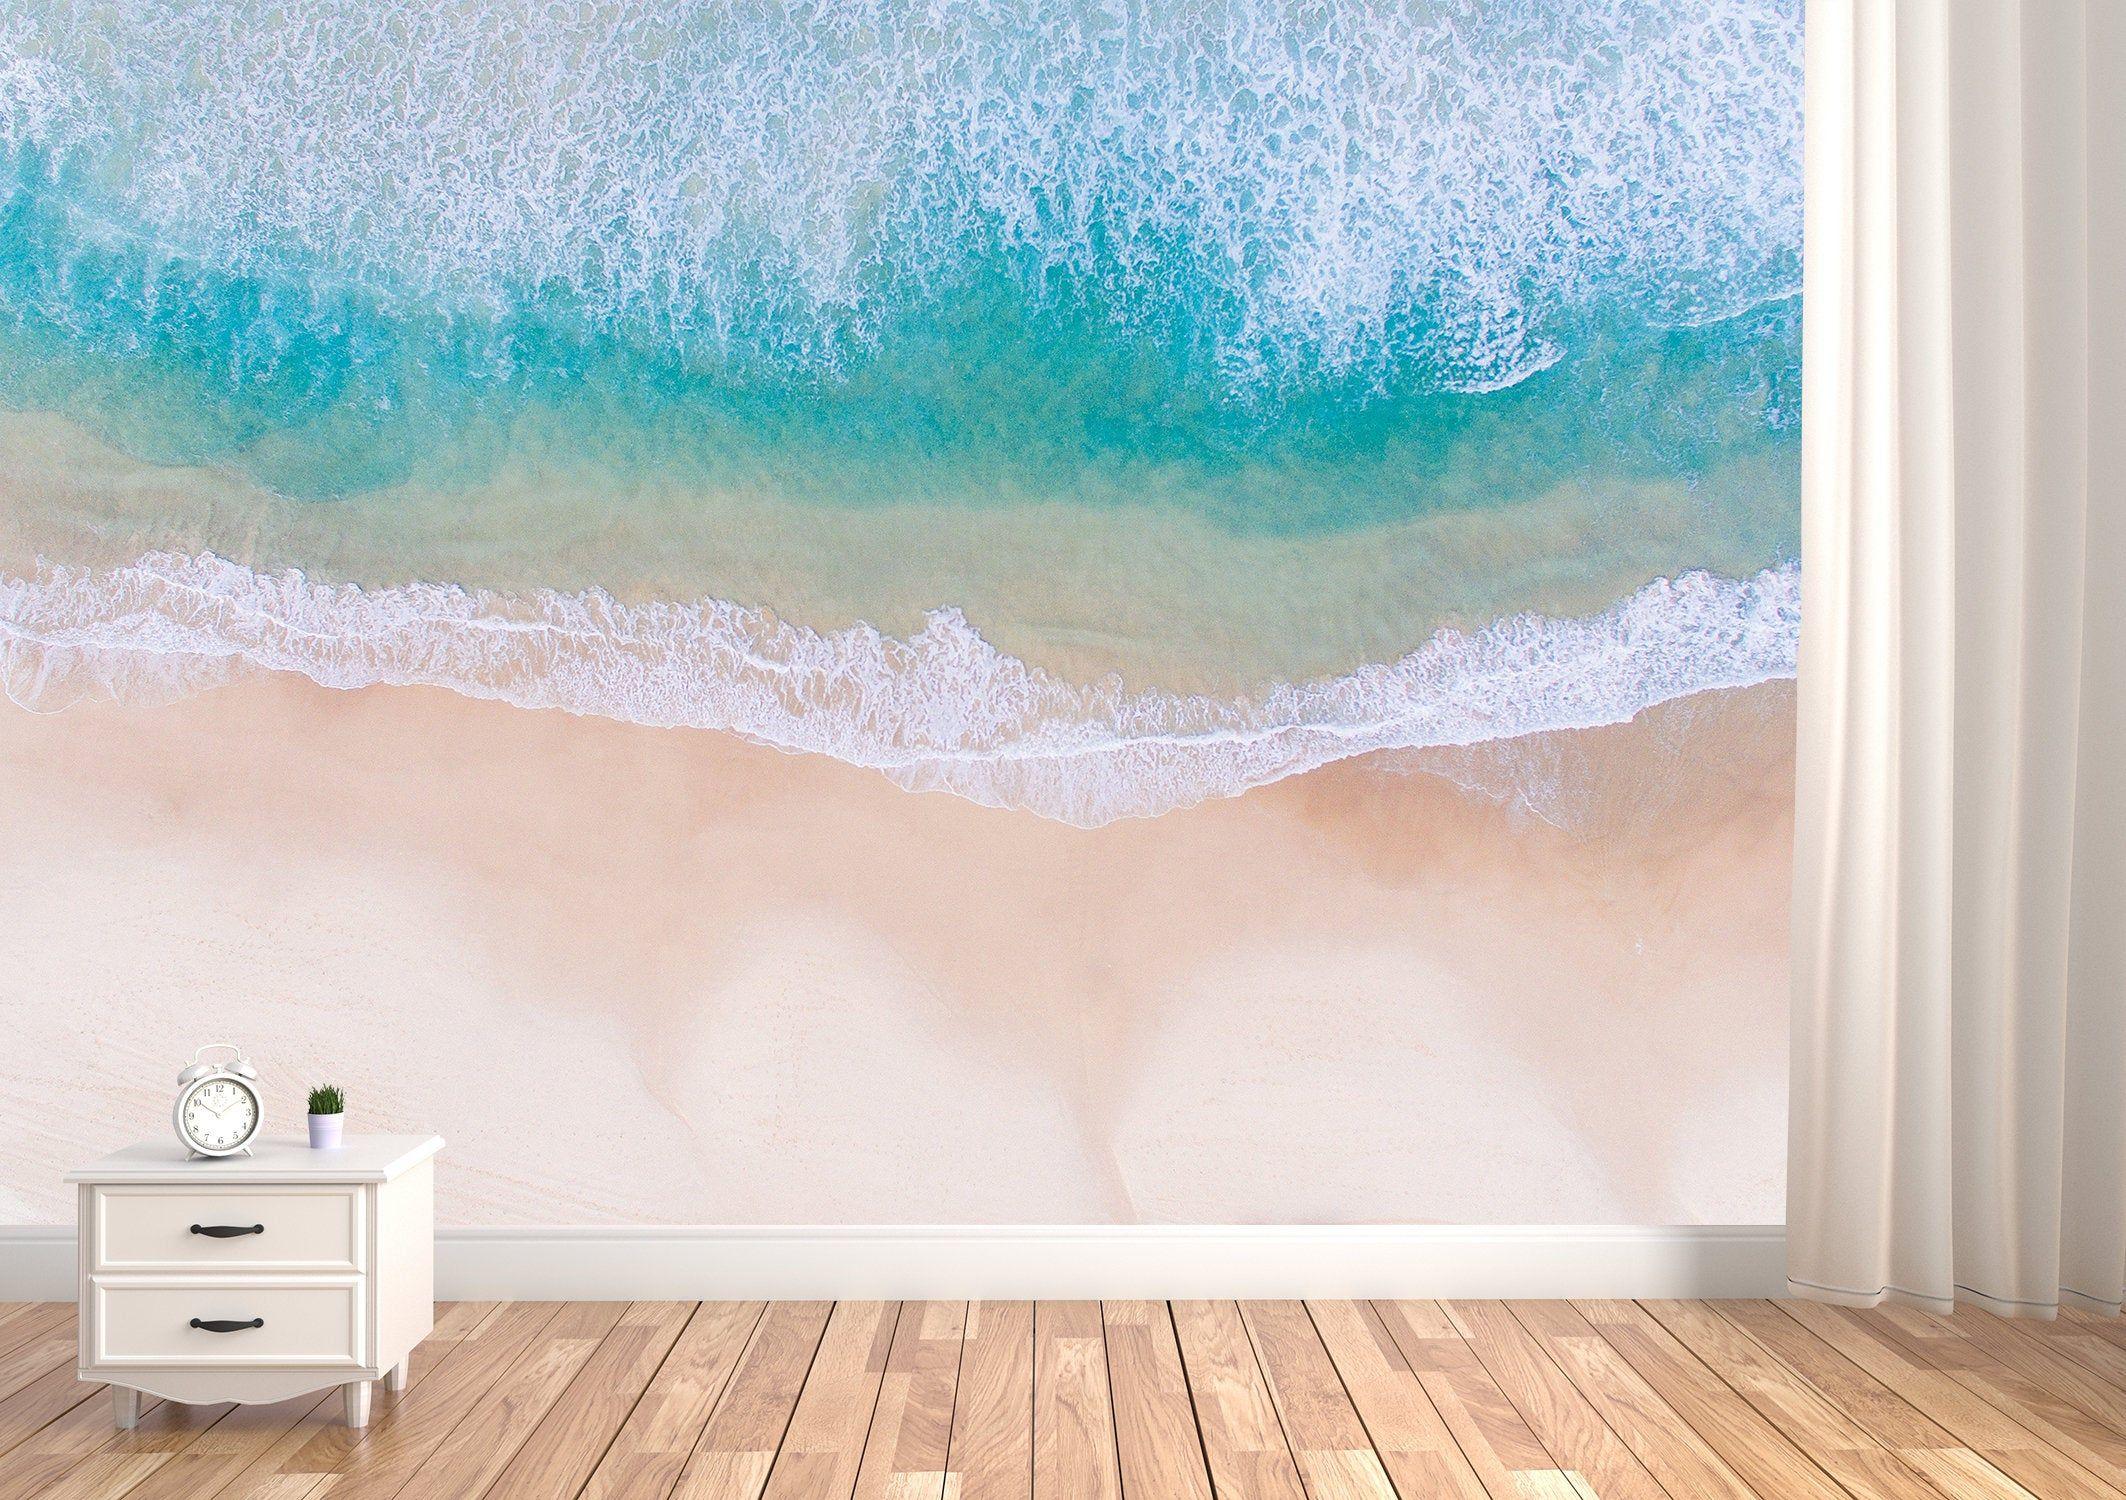 Removable Peel&Stick Vinyl Wallpaper Beach Waves Mural Sea